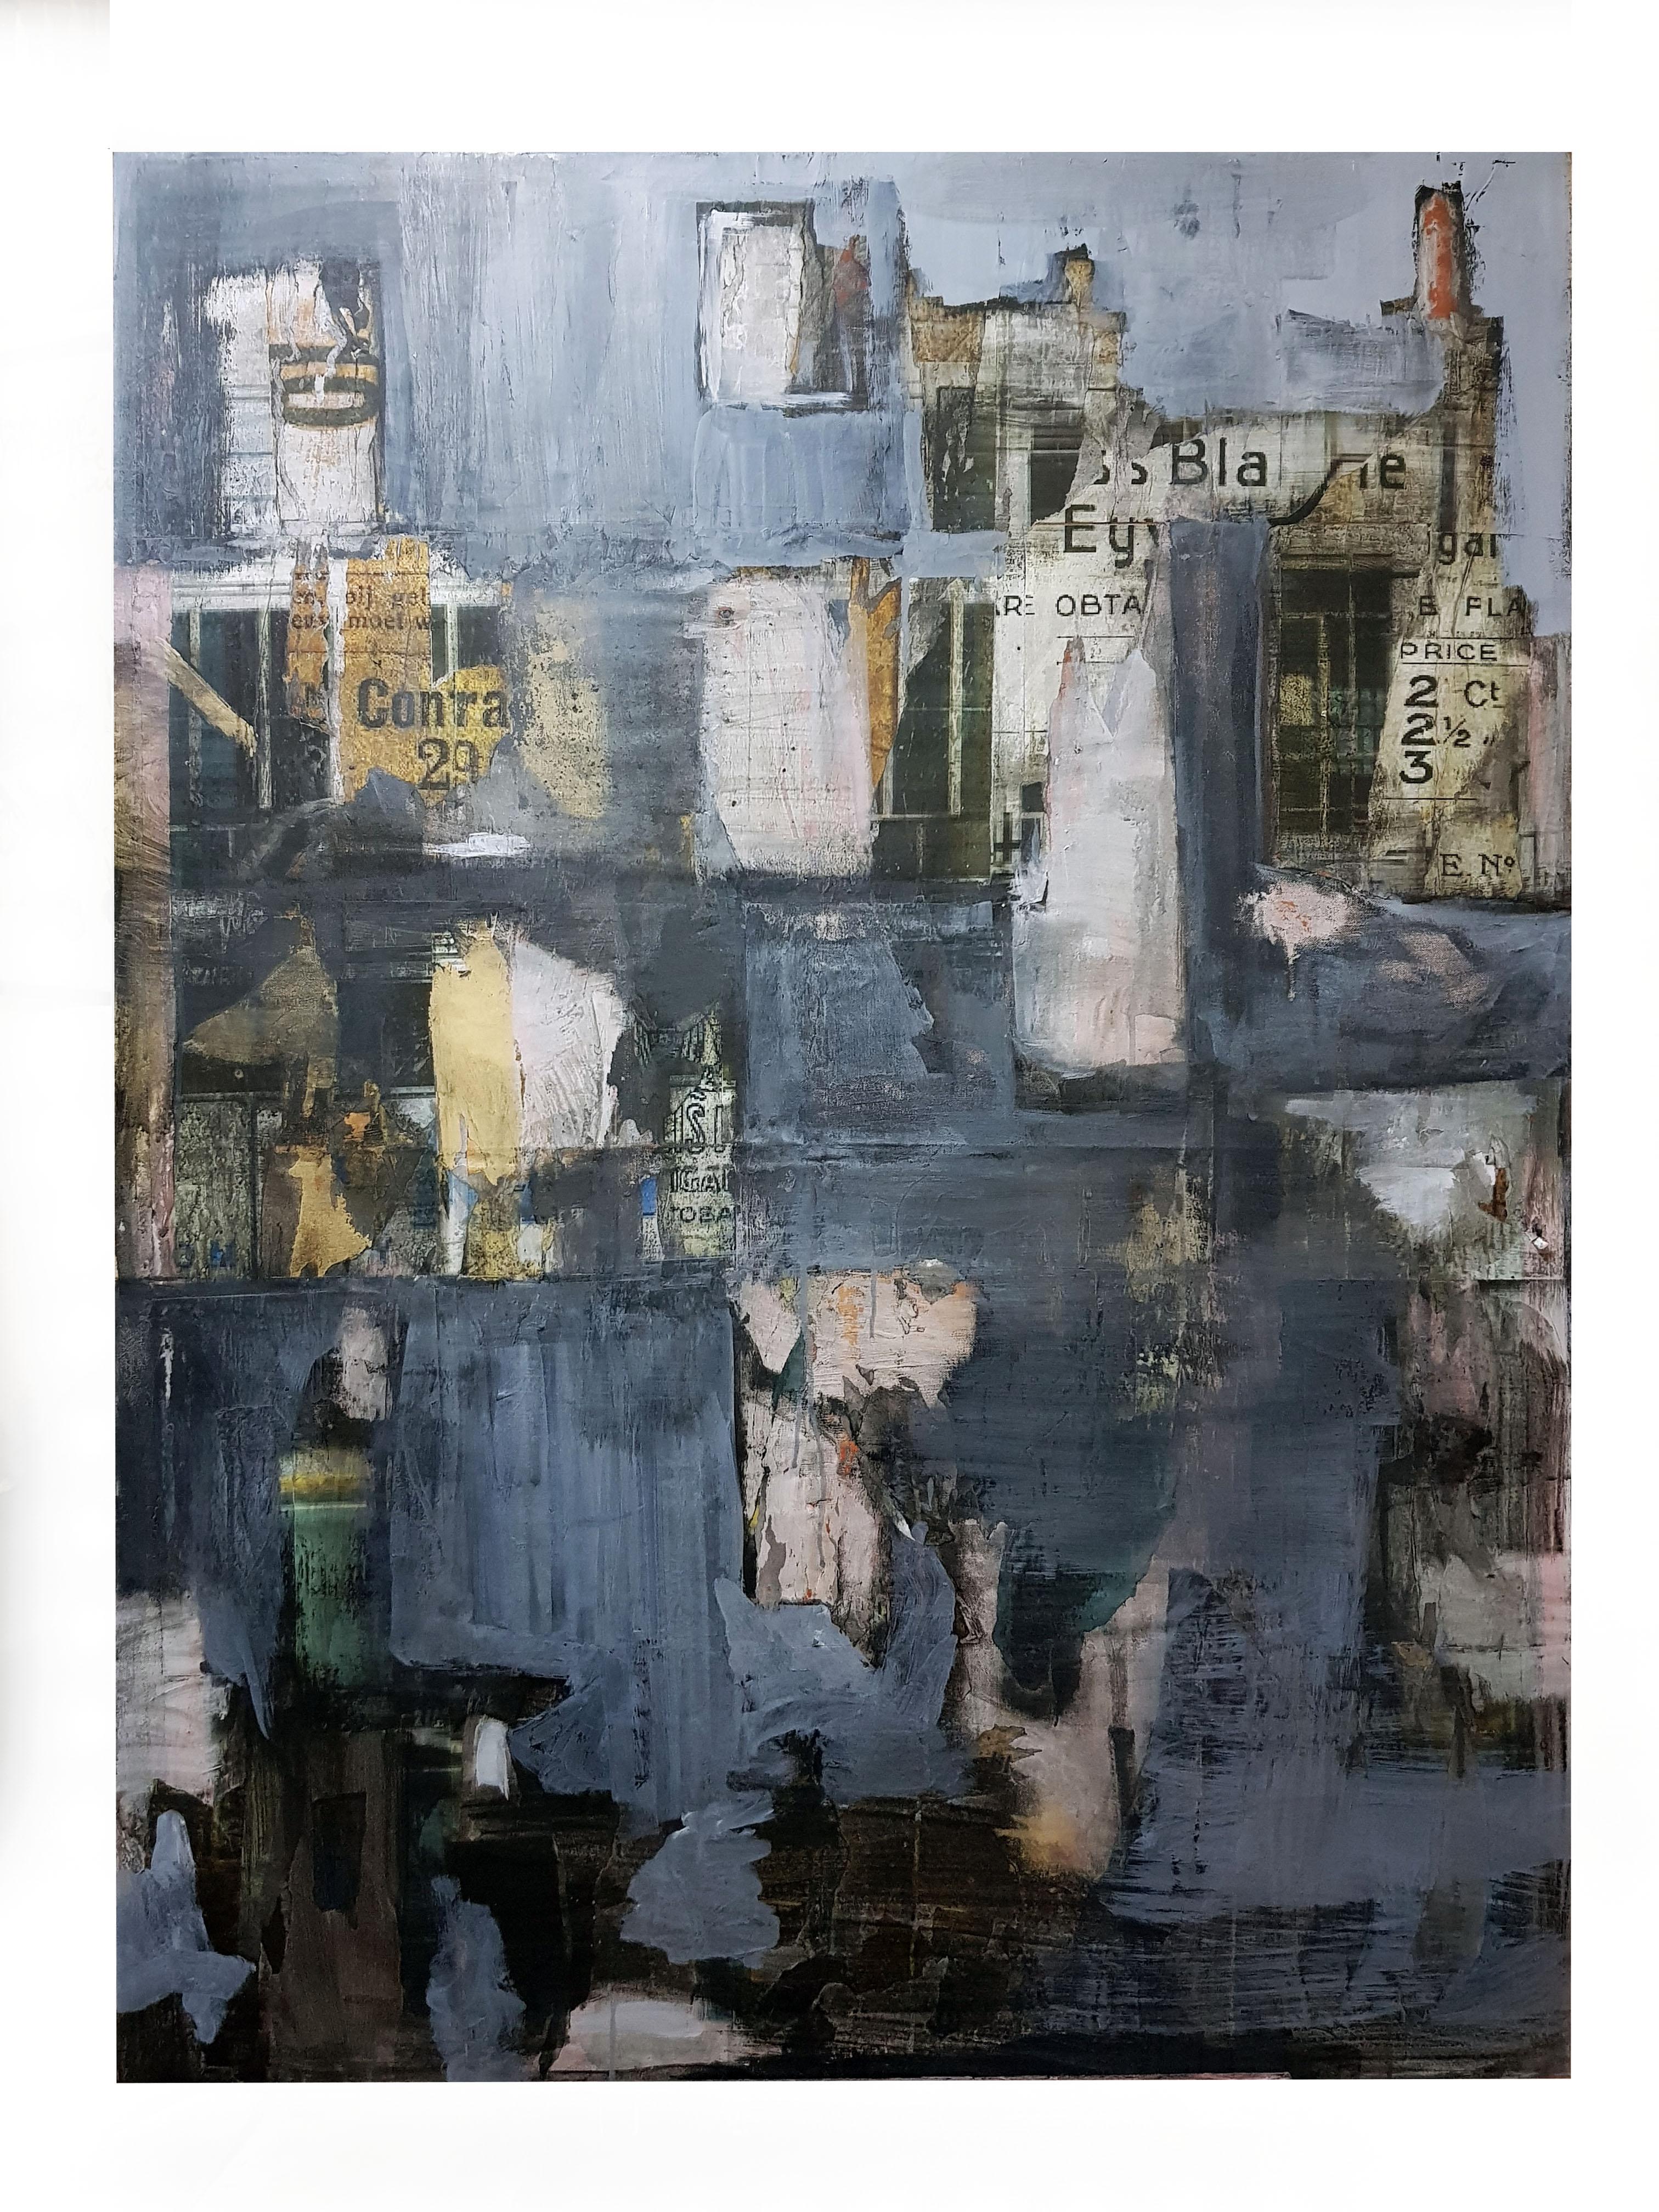 Rosa Luxemburg Straße oil and acrylic on canvas 60 x 48 in 2018.jpg